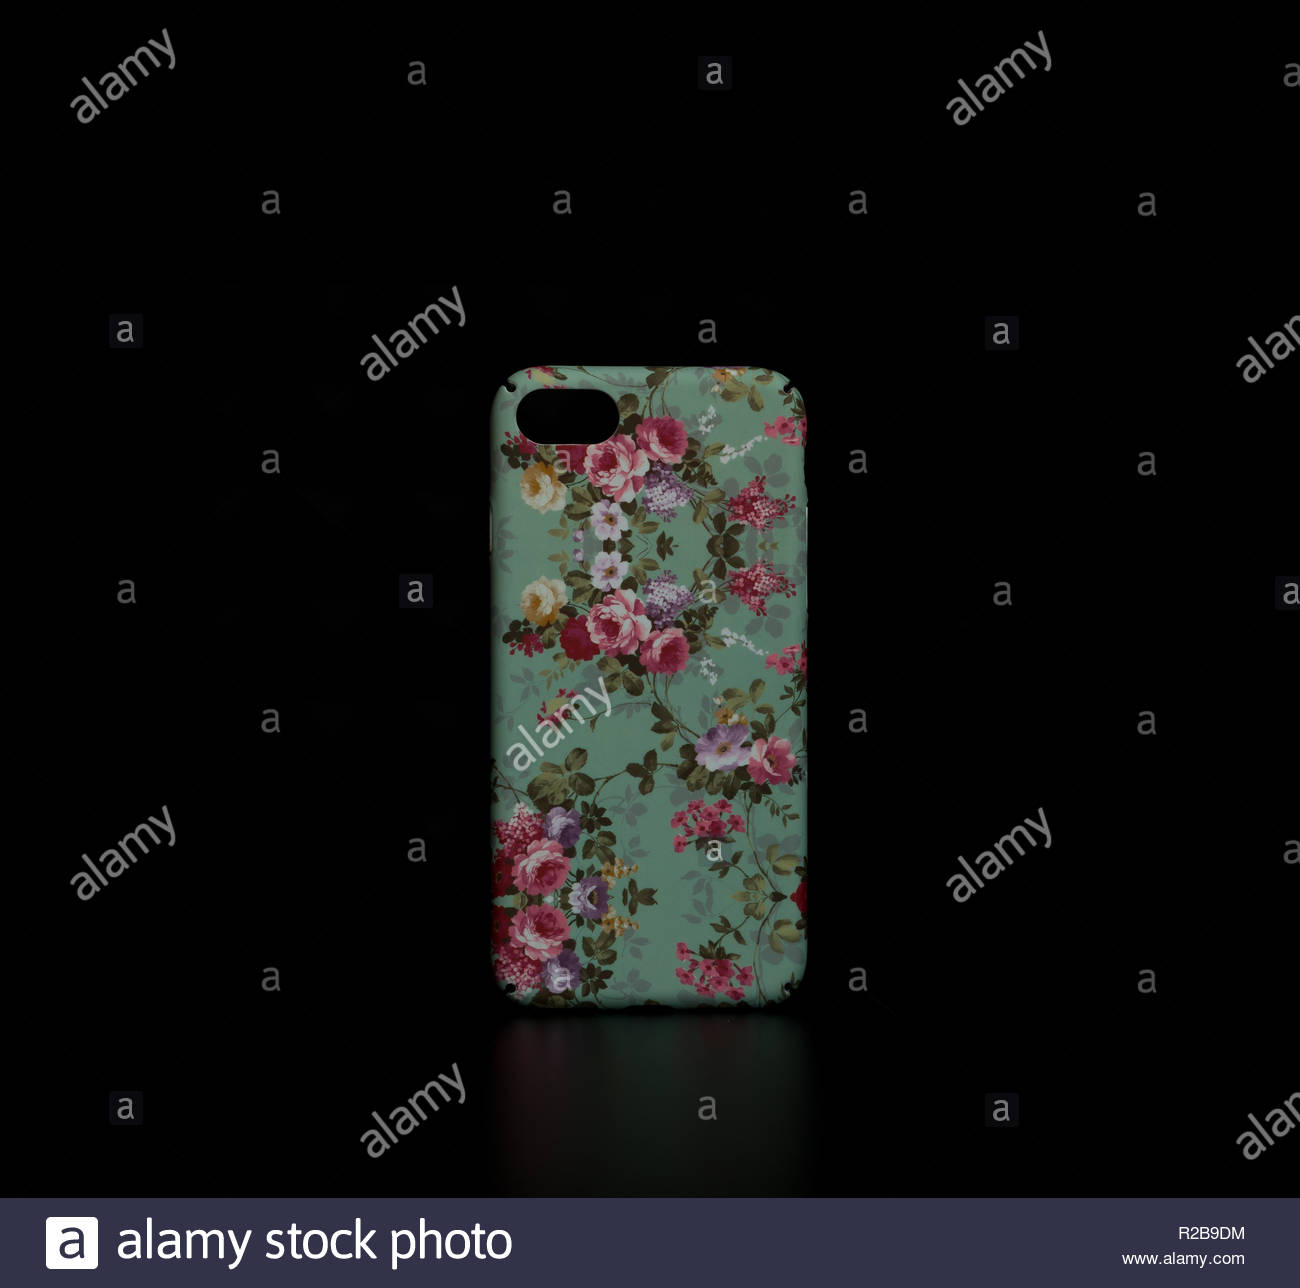 Design Floraw casi telefono per iphone Immagini Stock